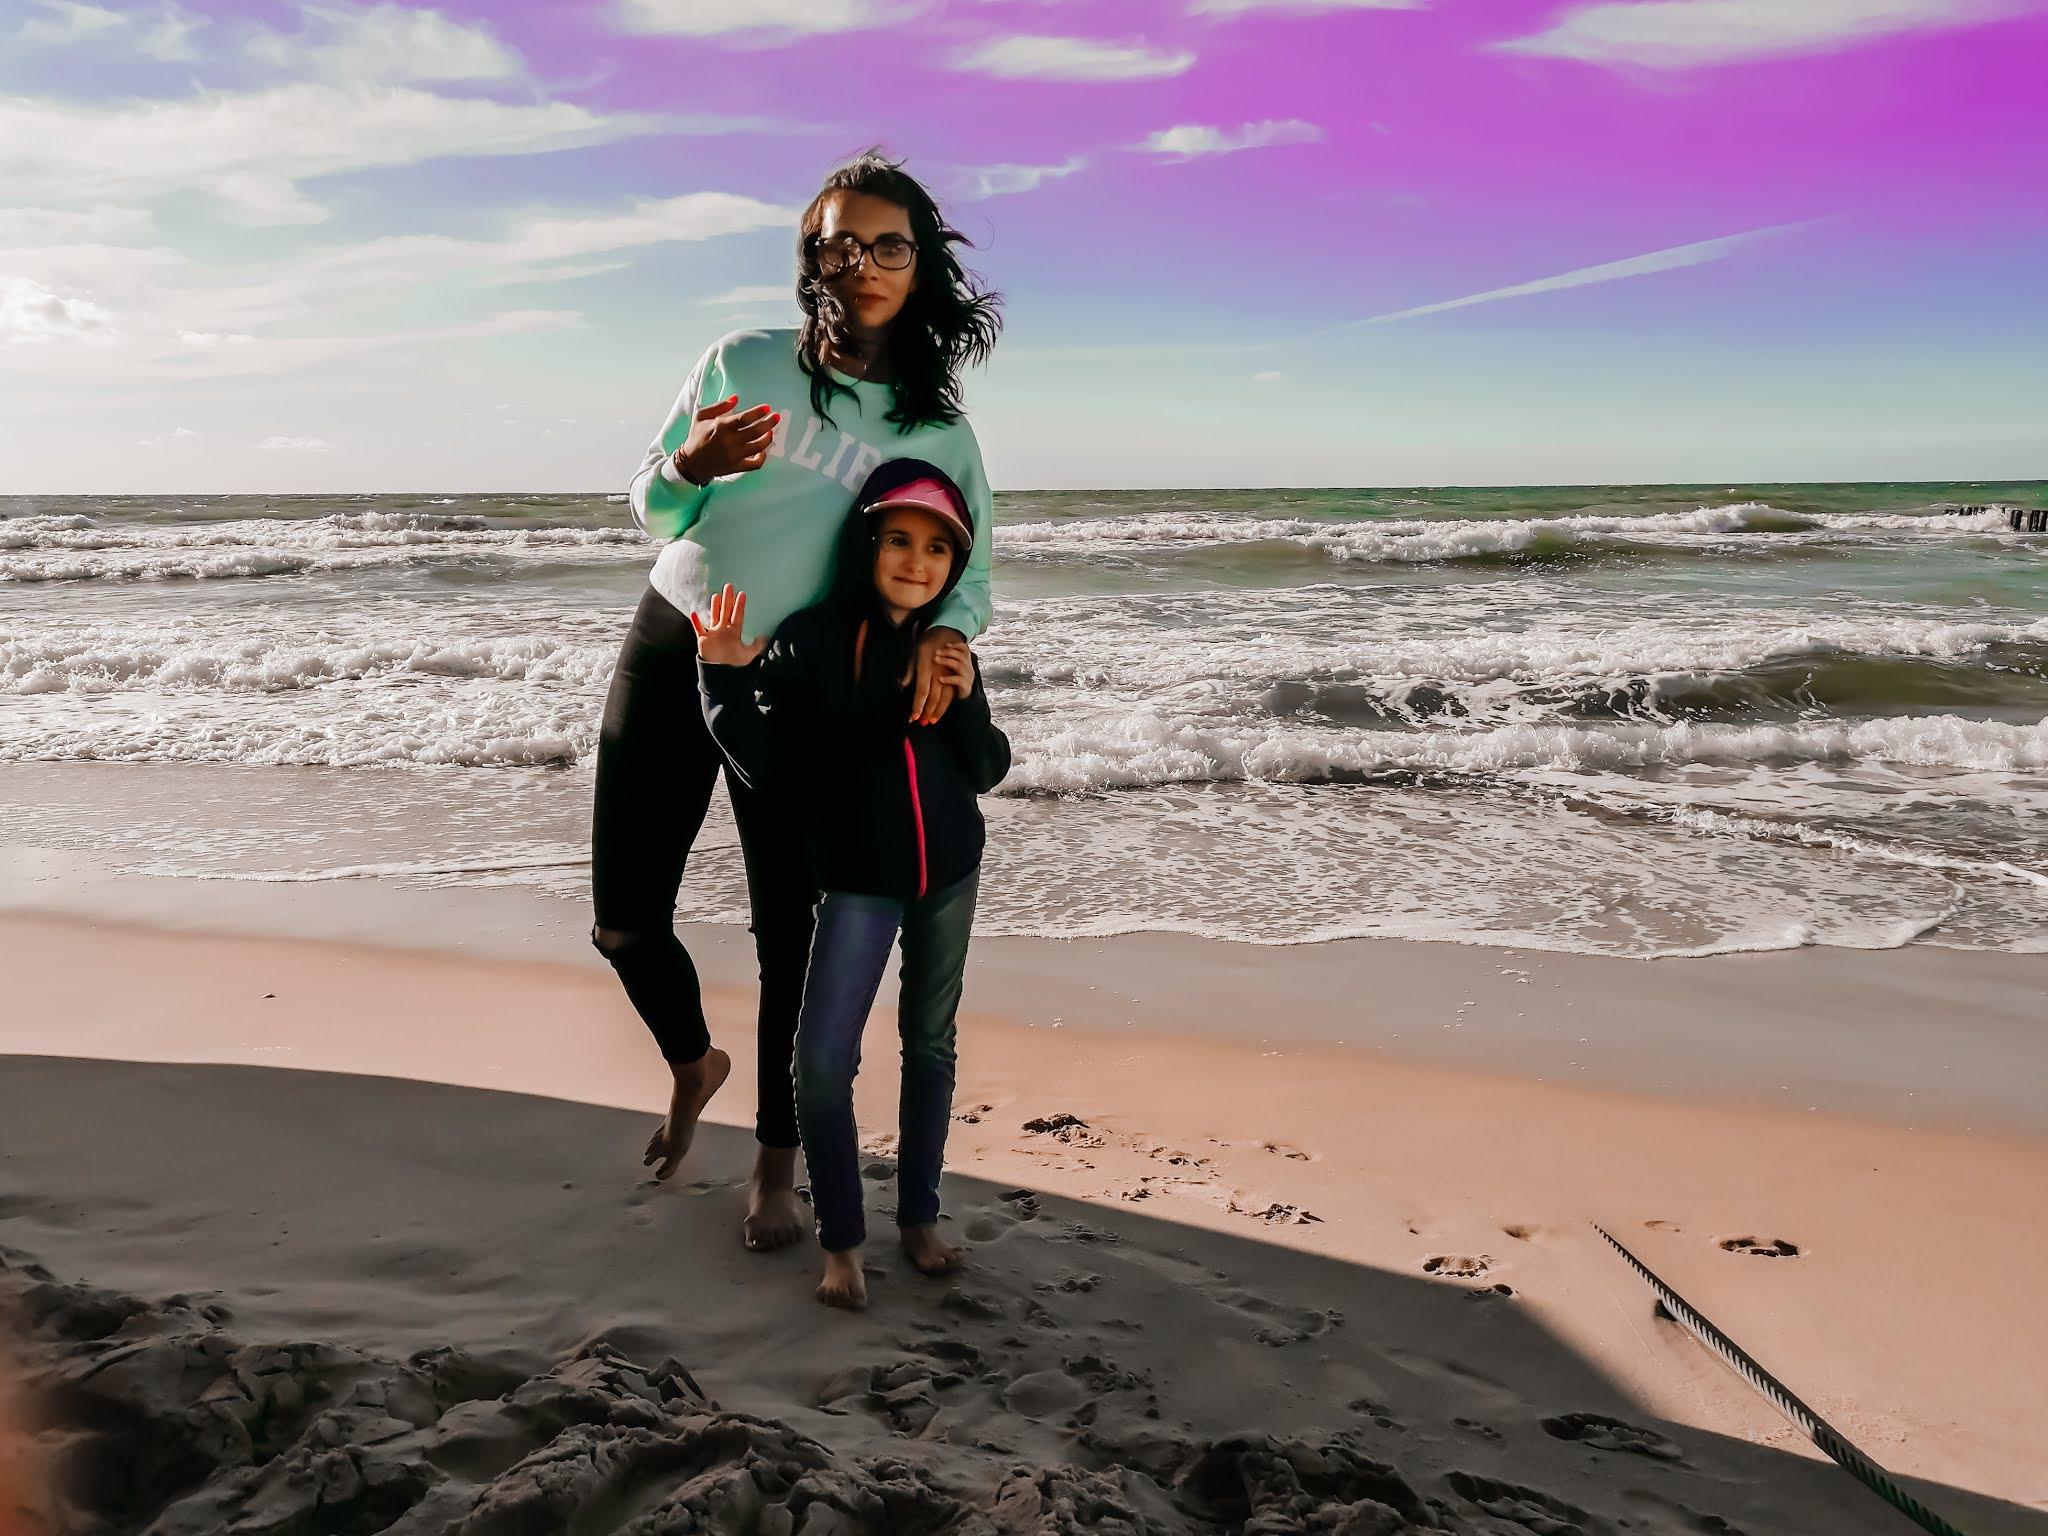 Plaża Unieście